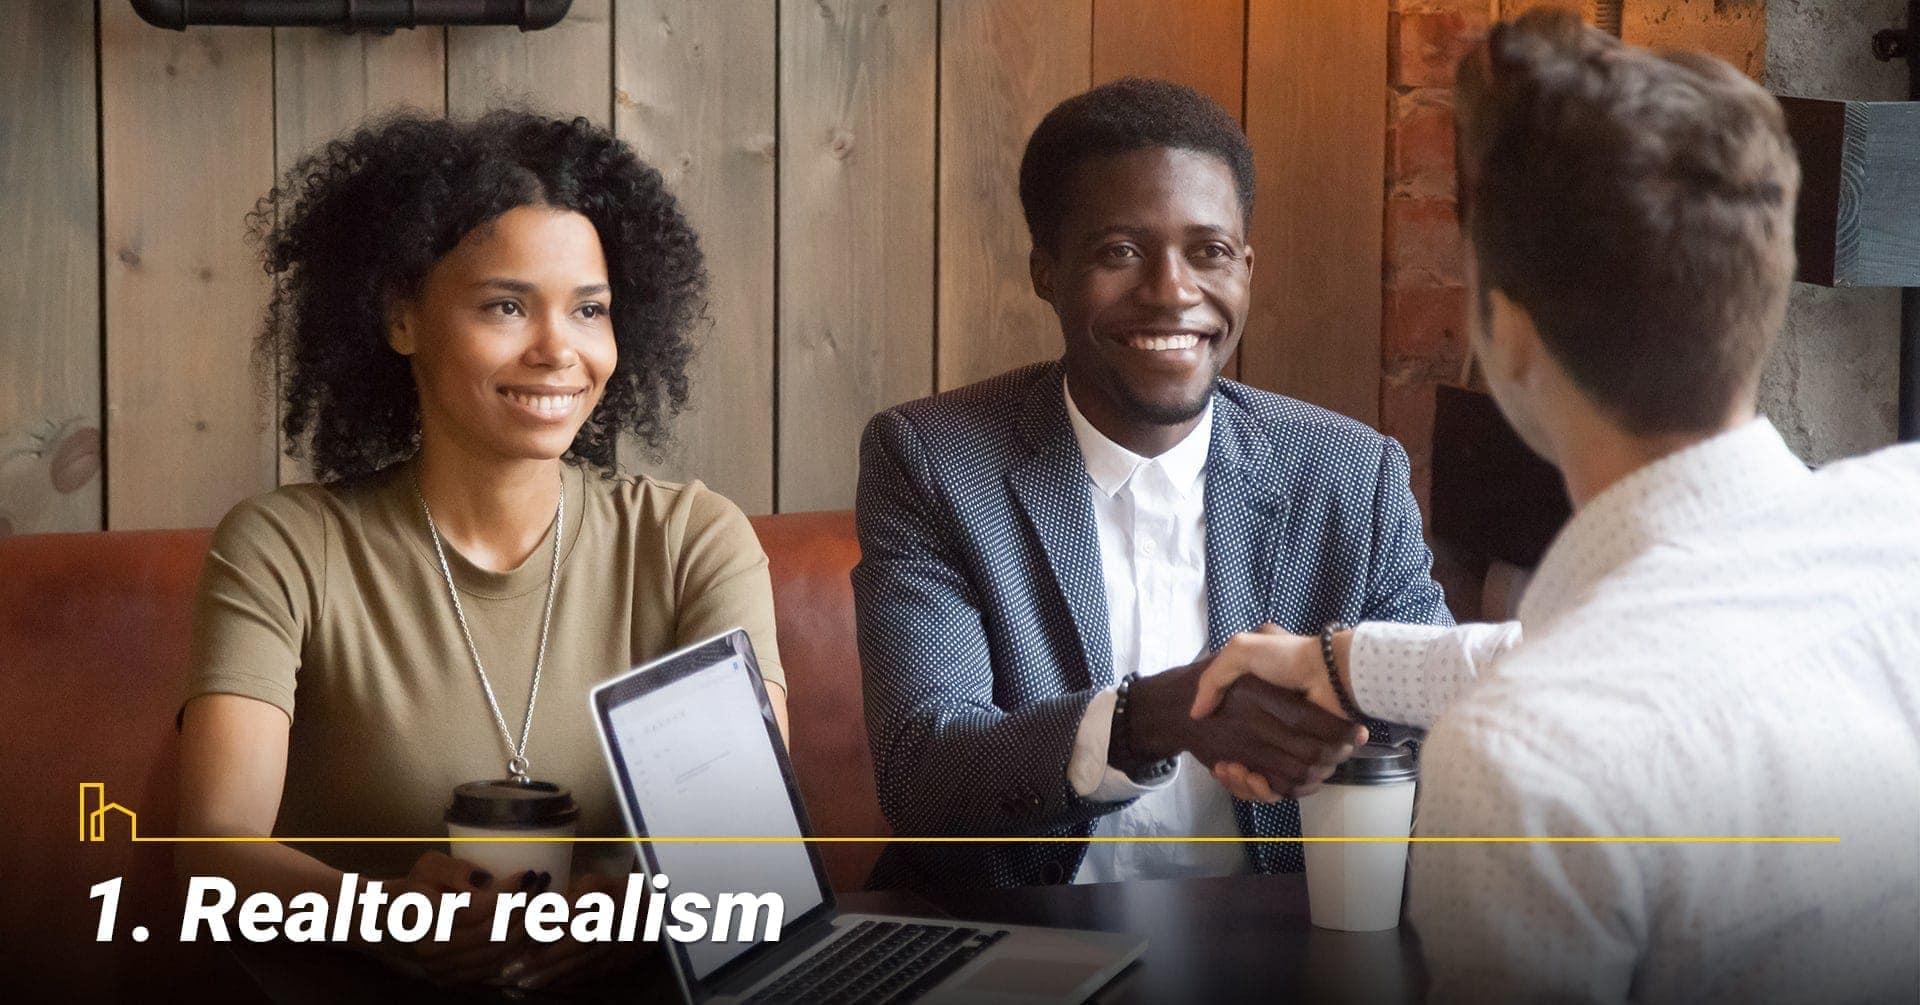 Realtor realism